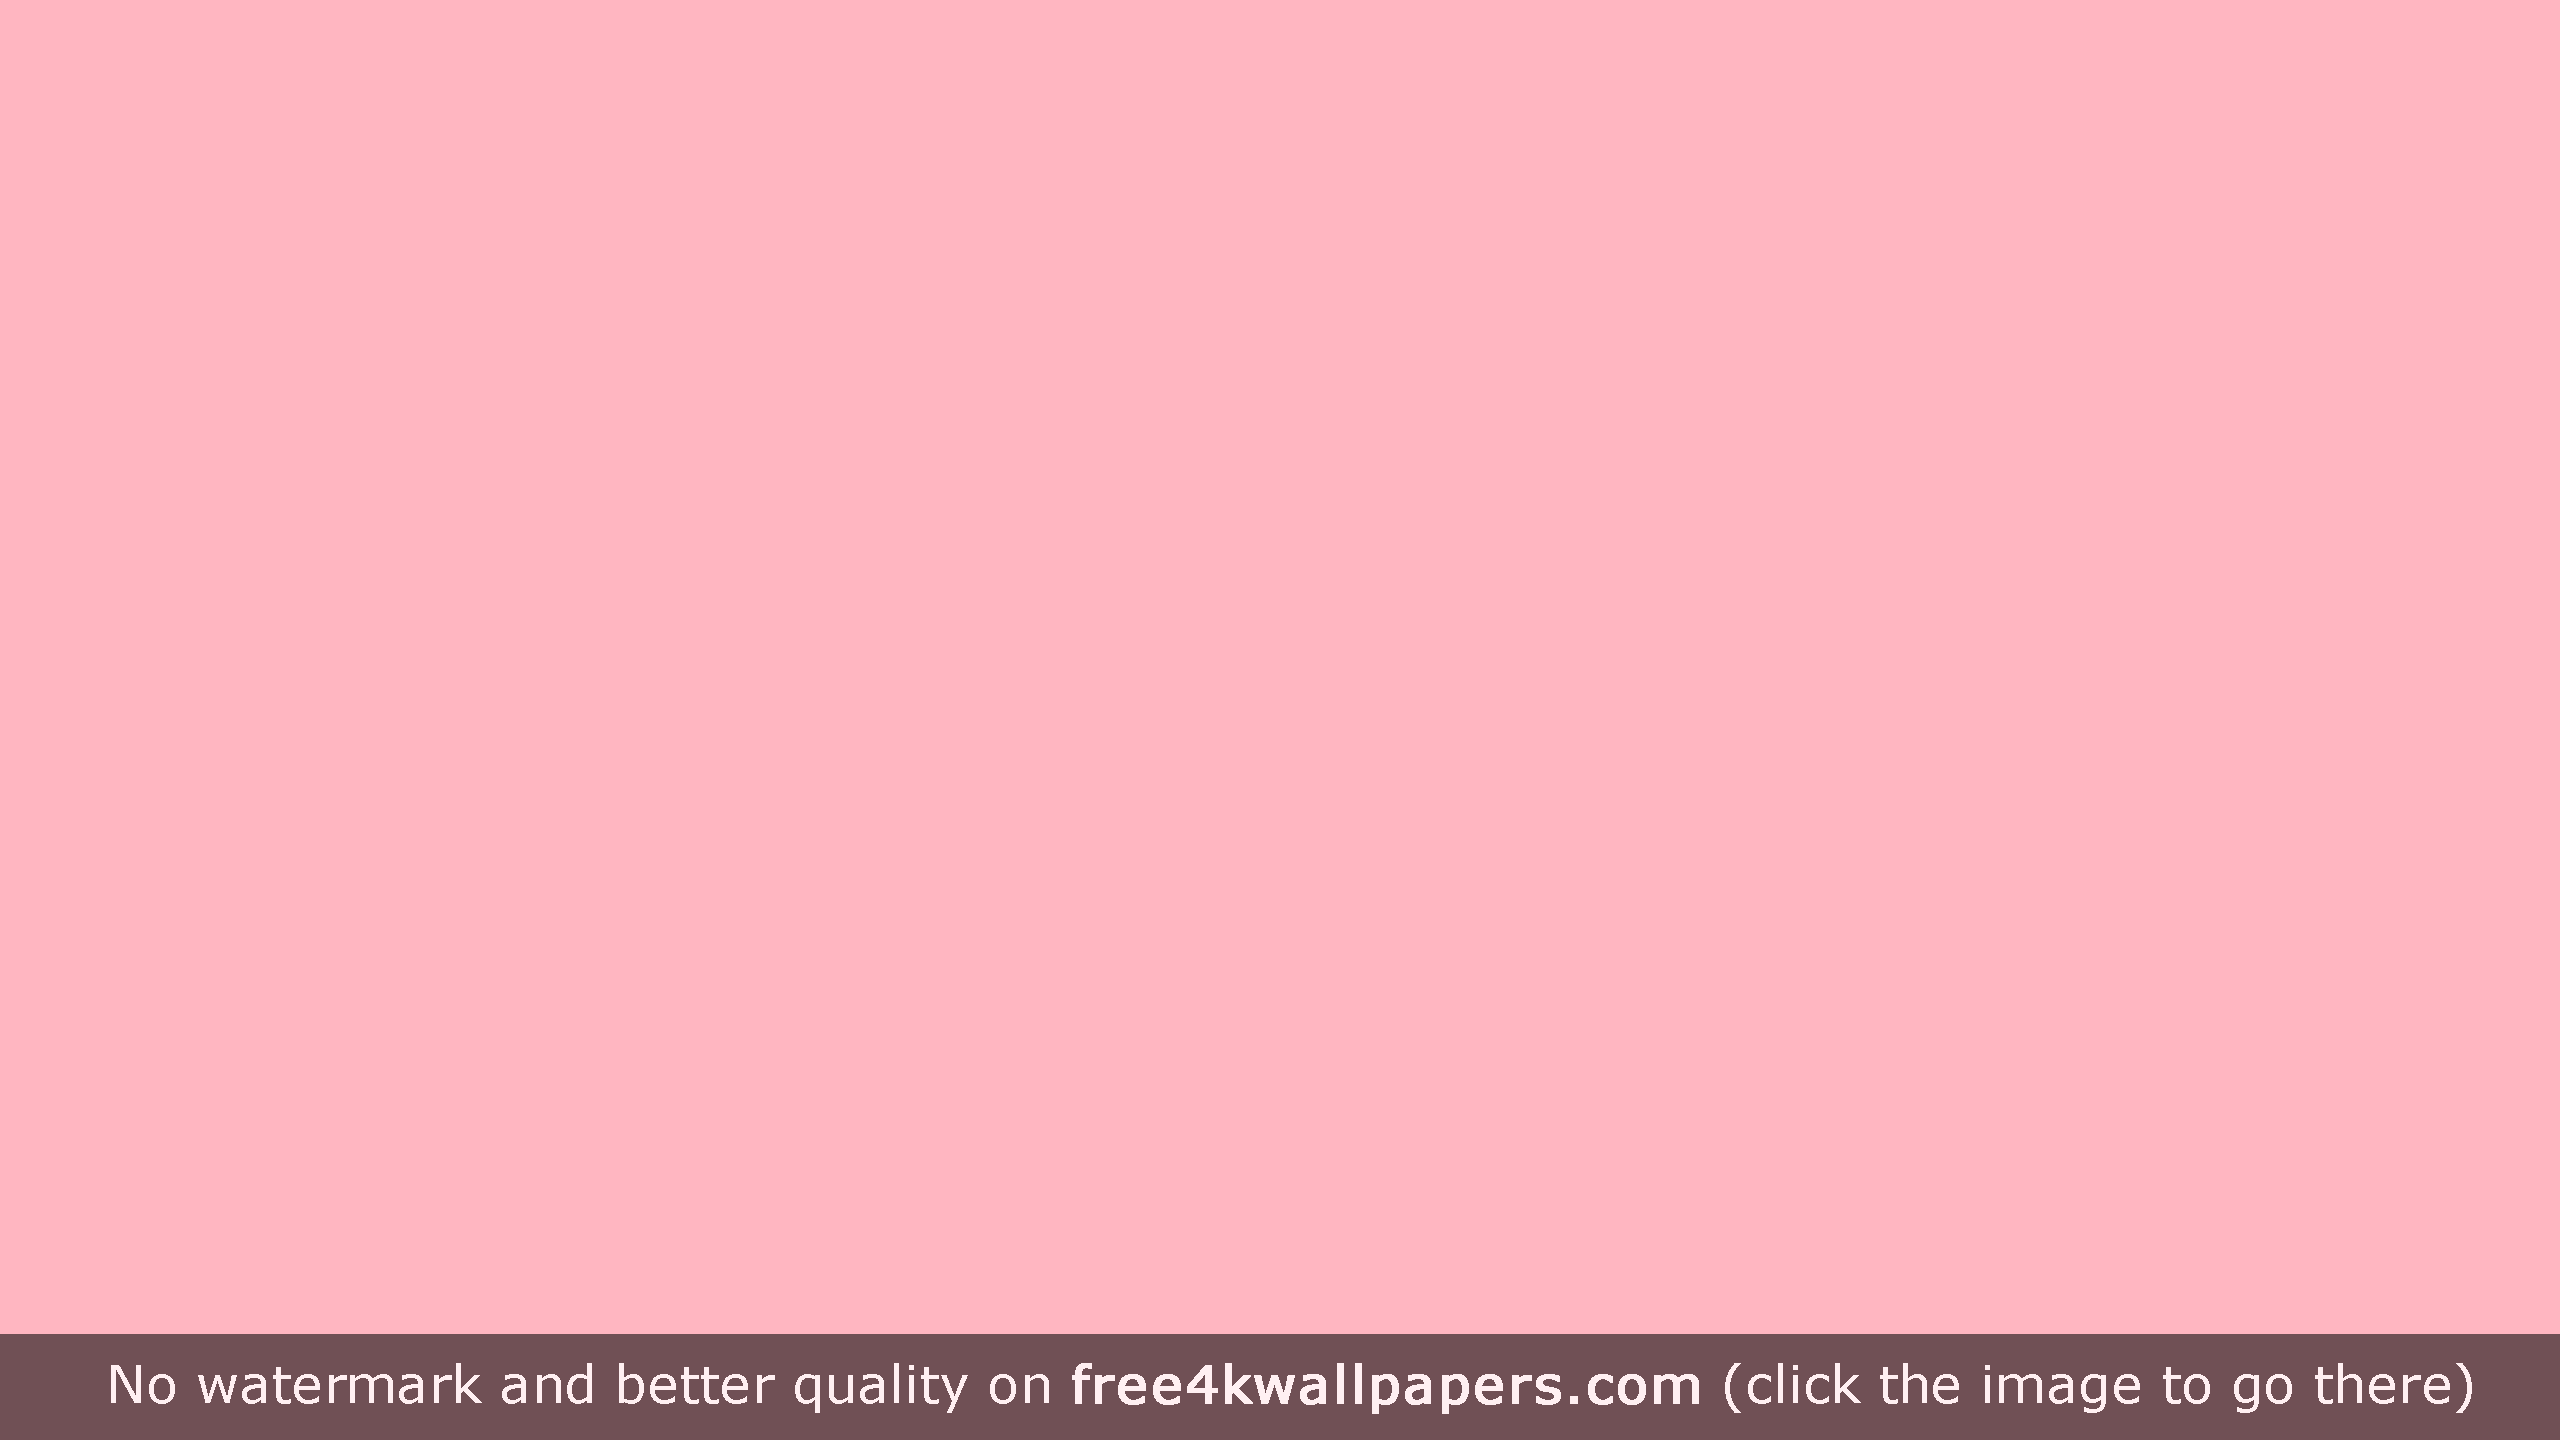 background wallpaper tumblr plain pink wallpapers - Wallpapers Kid